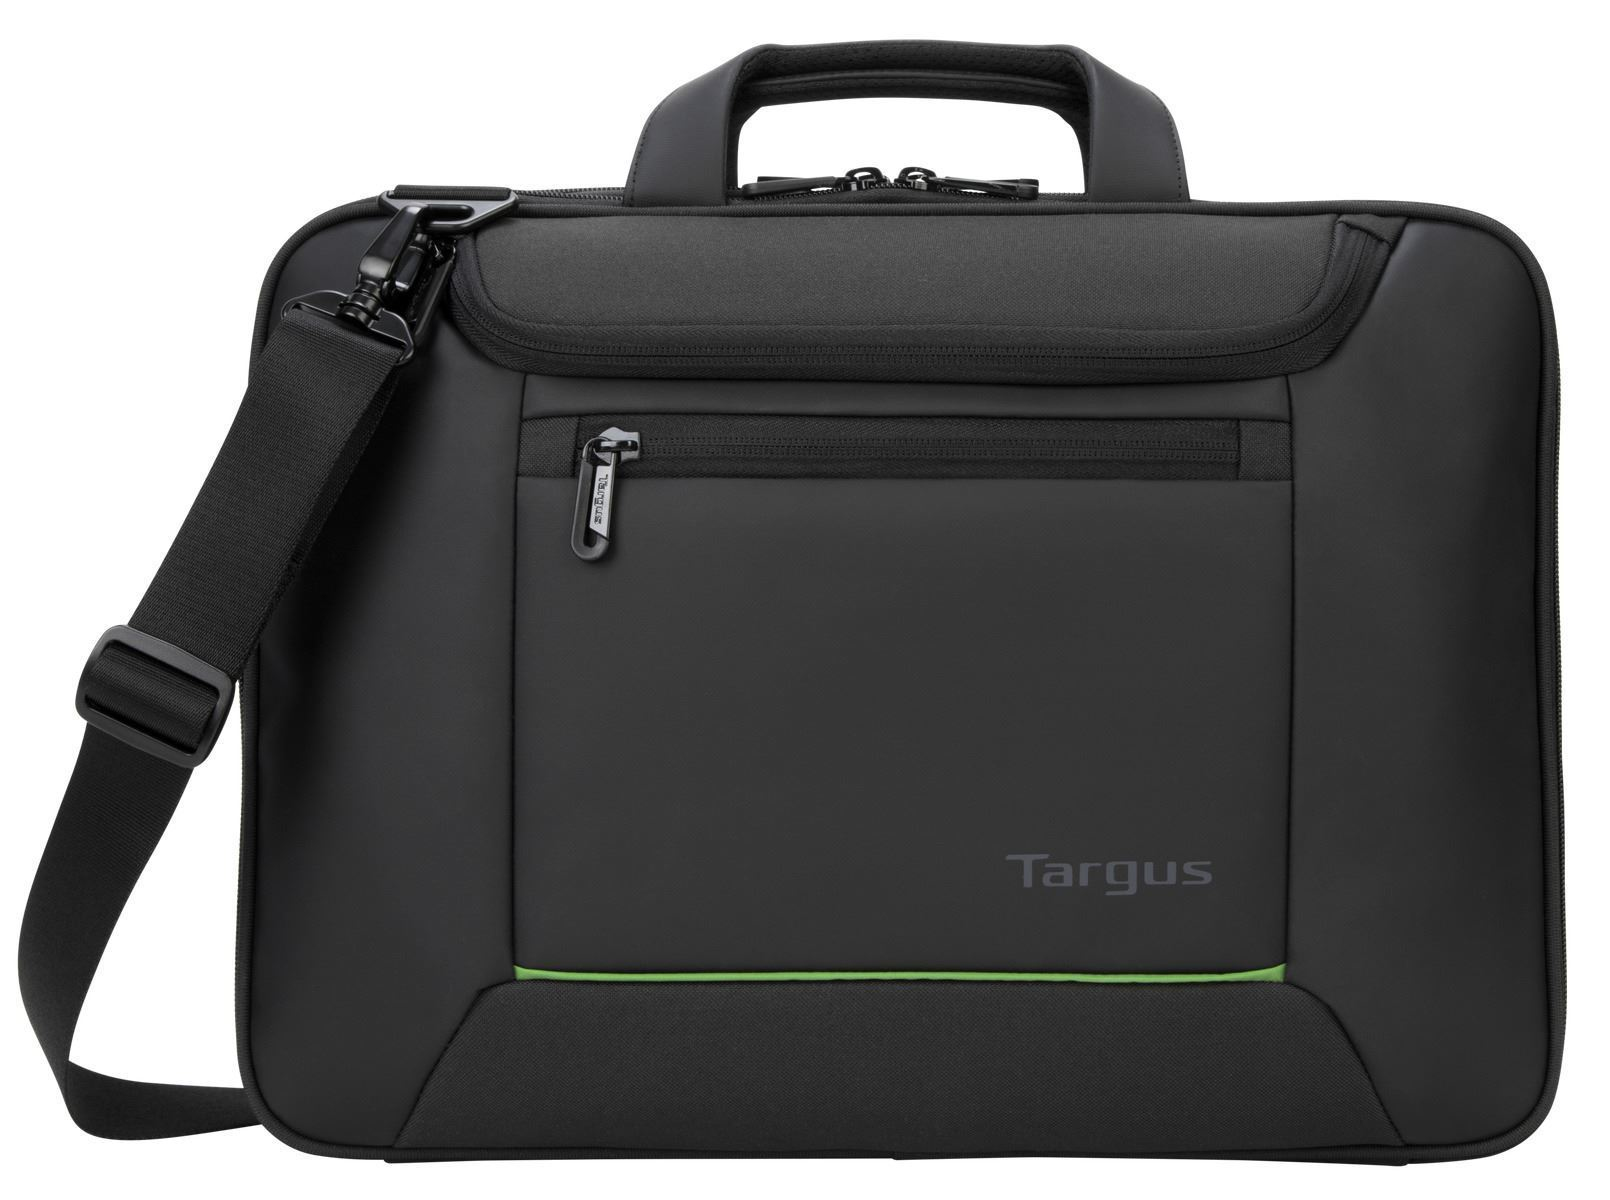 "Targus Balance Ecosmart 14"" notebook case 35.6 cm (14"") Briefcase Black"